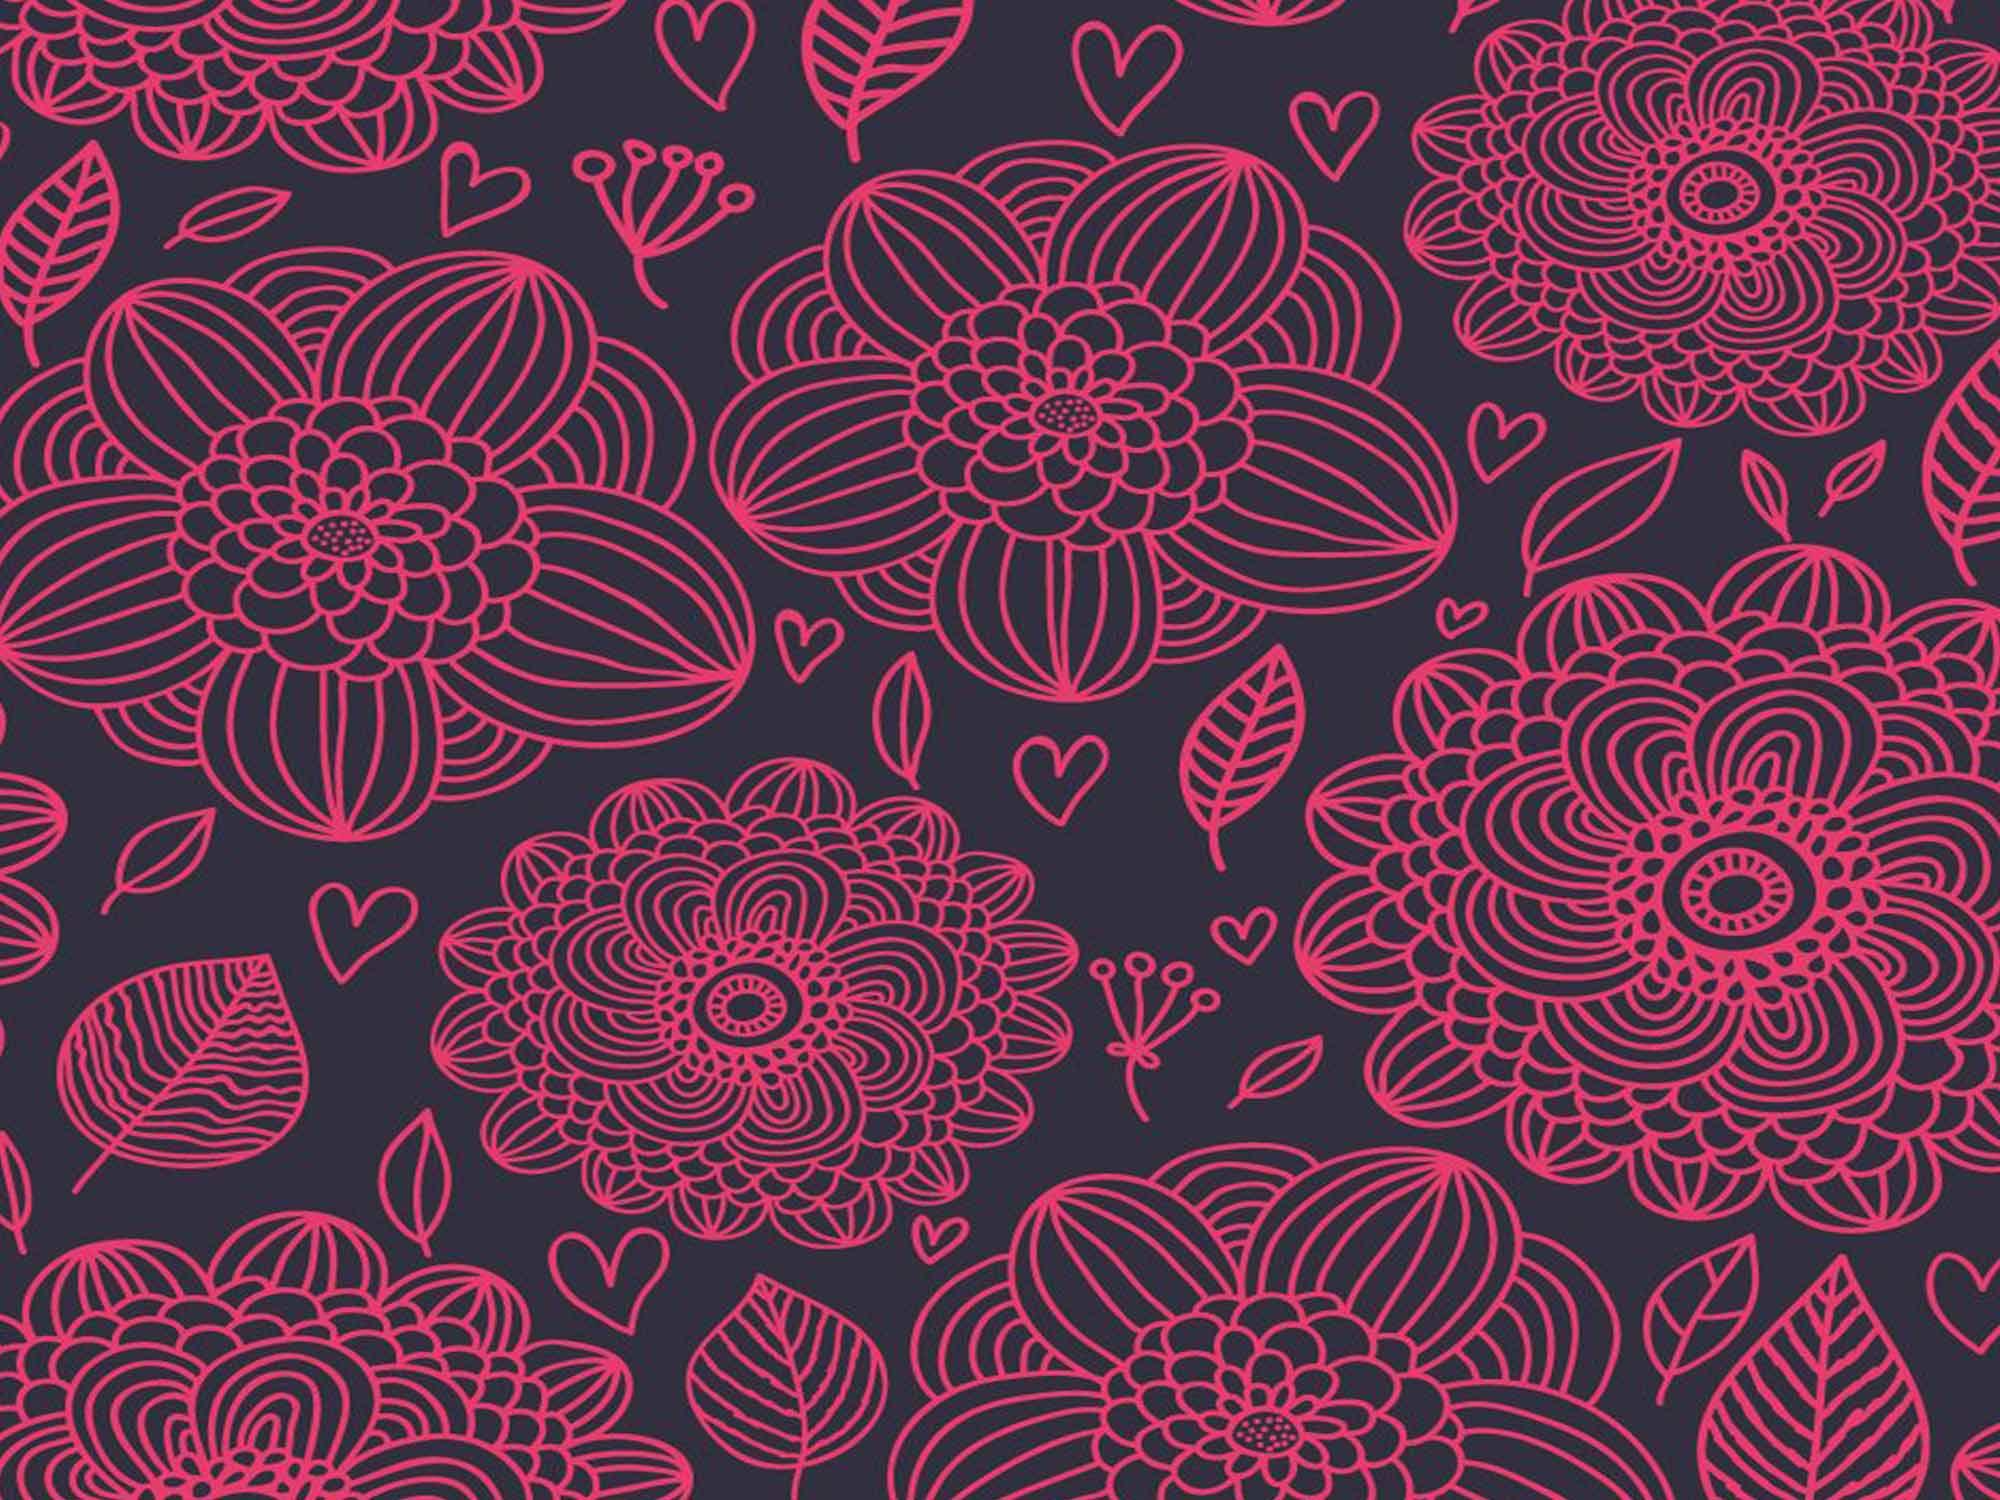 Papel de Parede Floral 0014 - Adesivos de Parede  - Paredes Decoradas